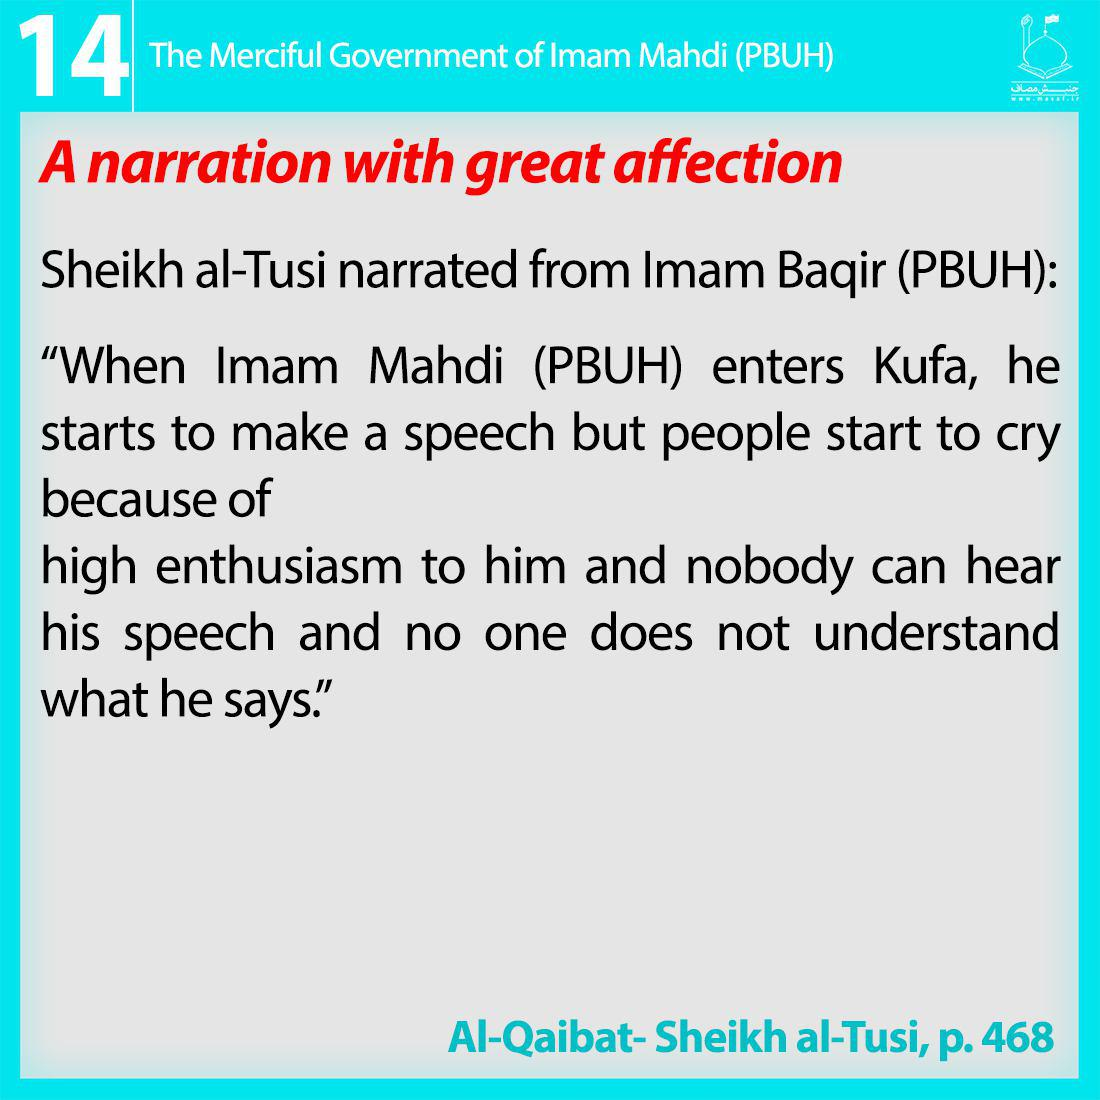 12th imam , 12th imam prophecy . imam mahdi , who is 12th imam